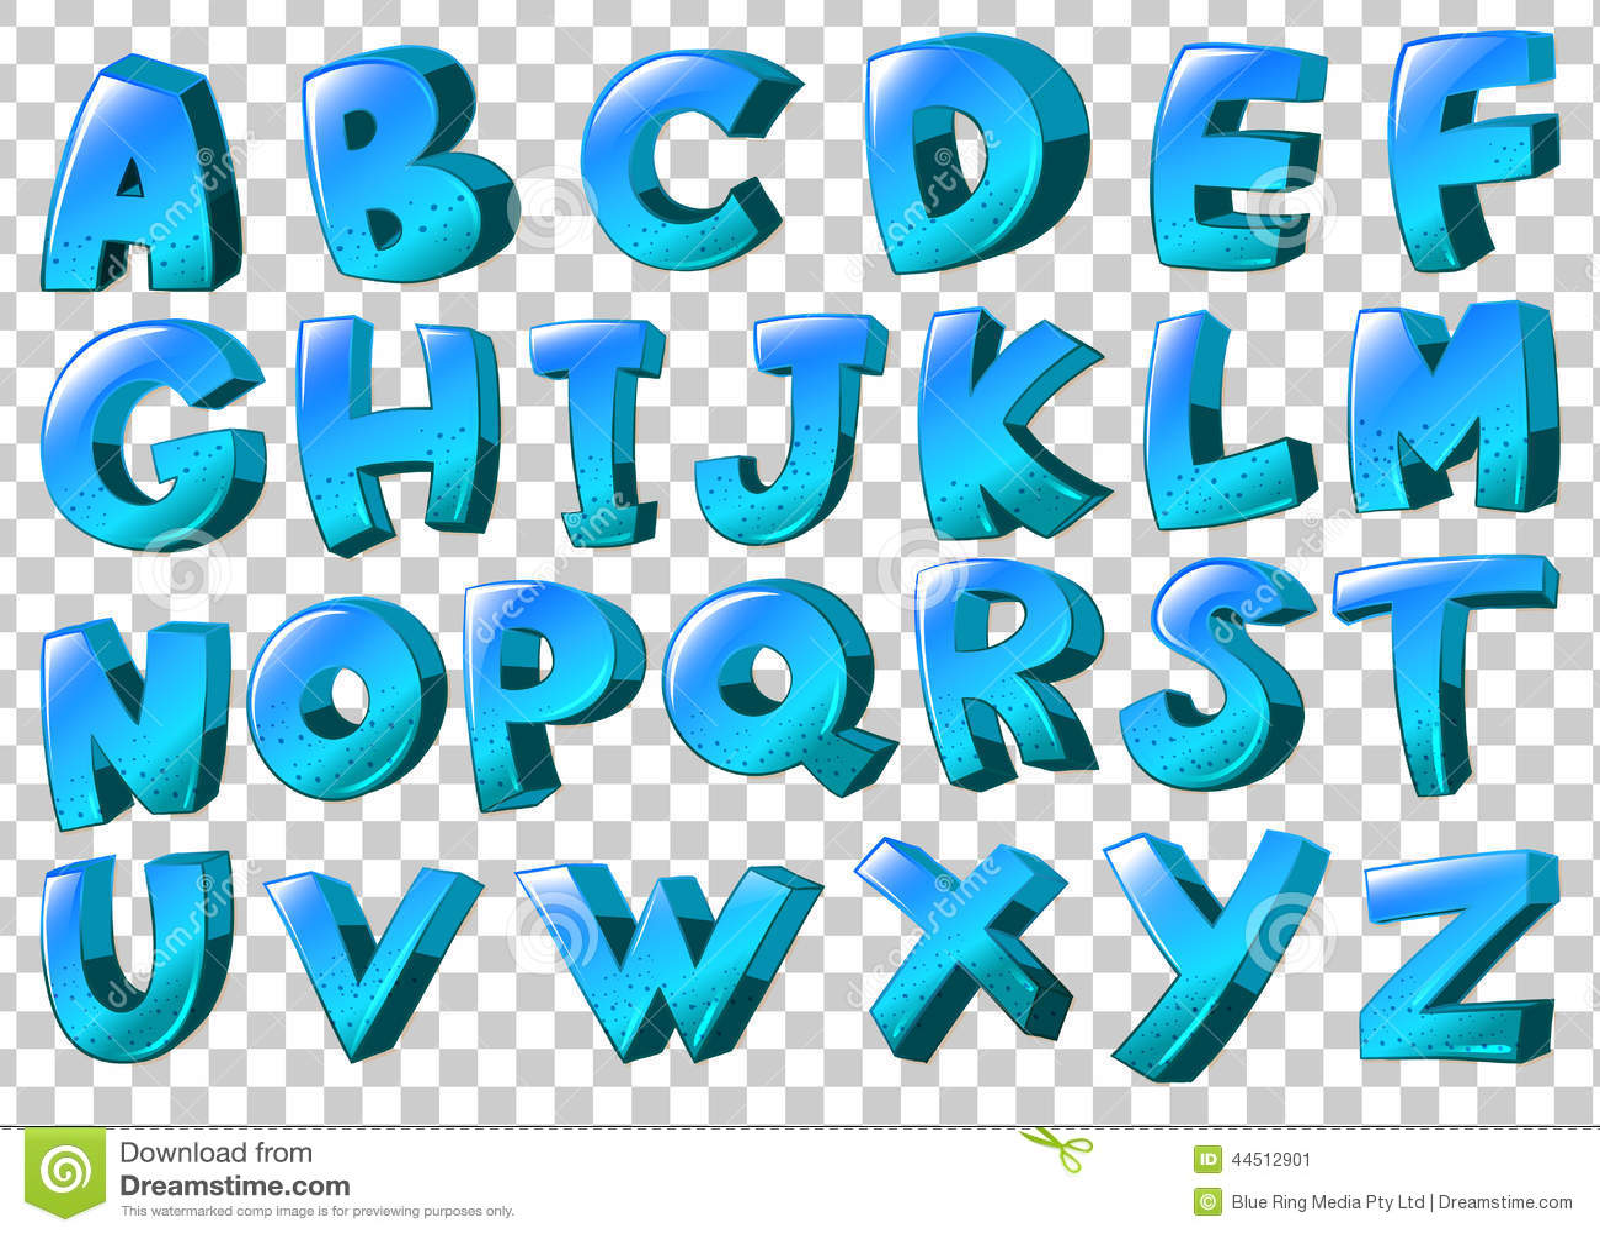 1 Npt 4 Deg X Barb 1 8 90